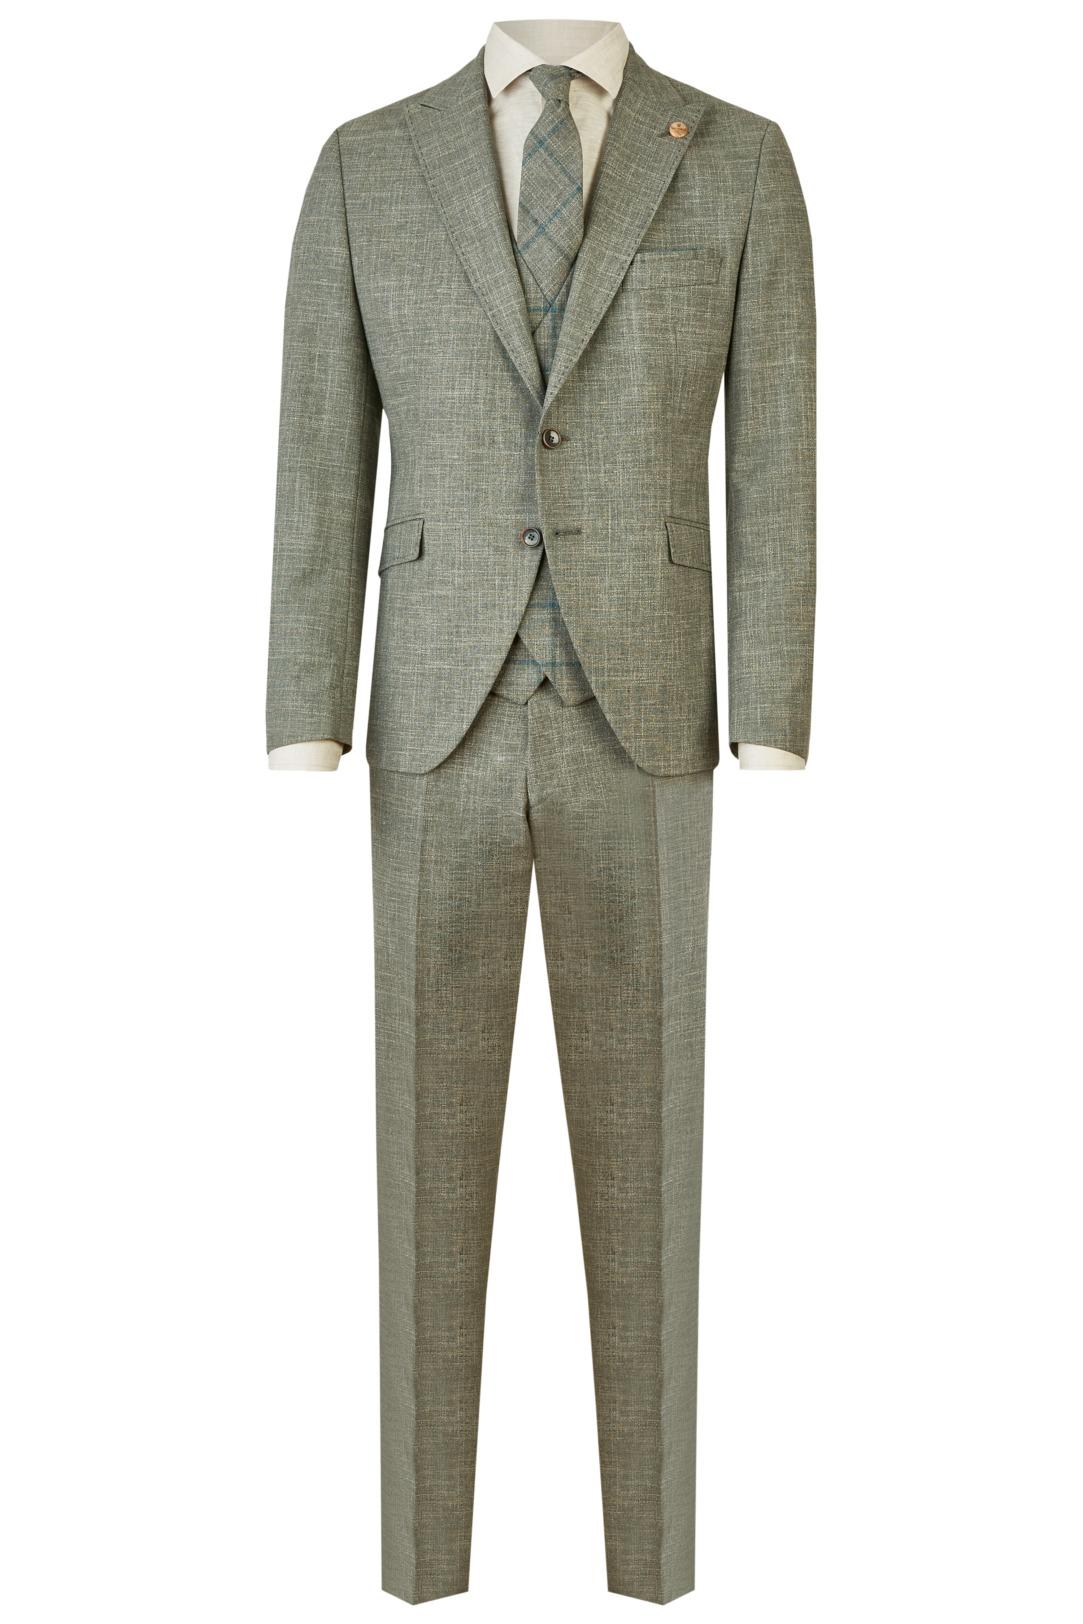 Wilvorst Green Wedding Hochzeitsanzug Männer Mode Bräutigam klassische Form vintage boho Stil hellgrün grün wil_0121_otf_gw-look-6_1